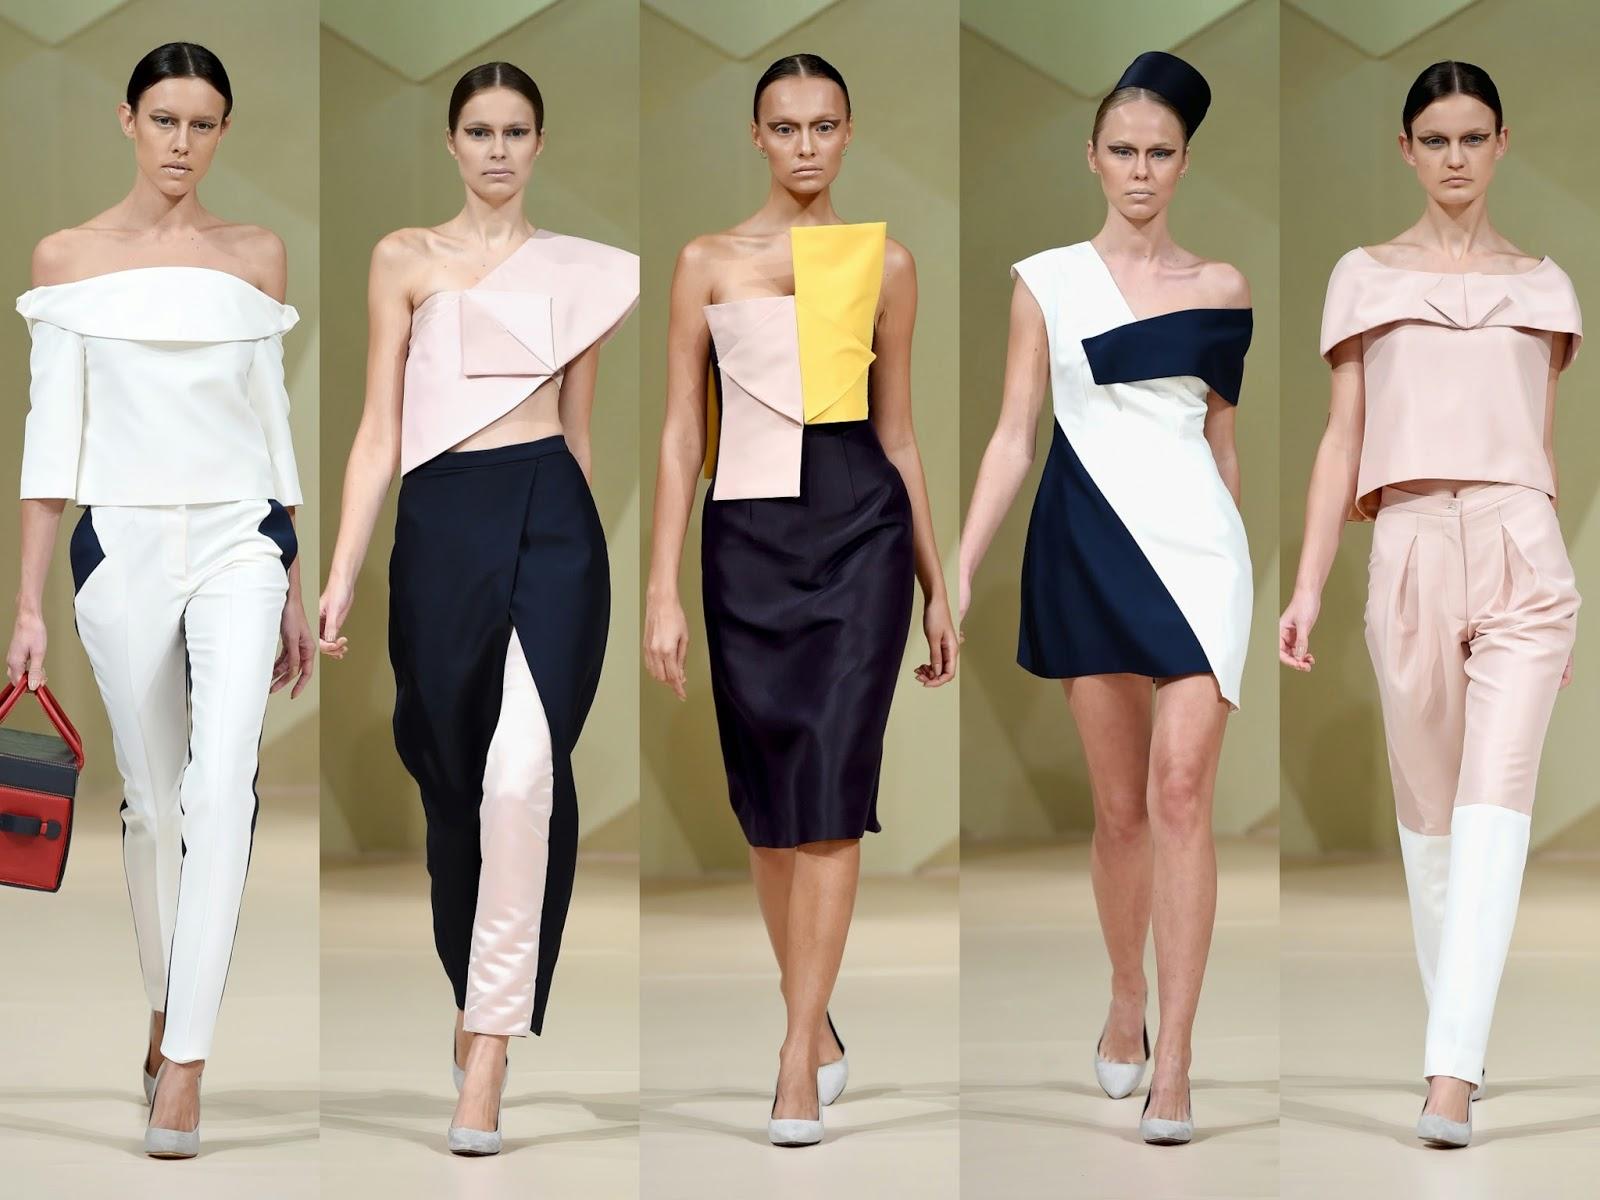 fashion, style, fashion show, fashion forward, fashion forward season 4, ffwd, ffwddxb, the style sorbet, dubai, my dubai, dubai fashion blog, fashion blog, blogger, style blogger, fashion blogger, dubai fashion blogger